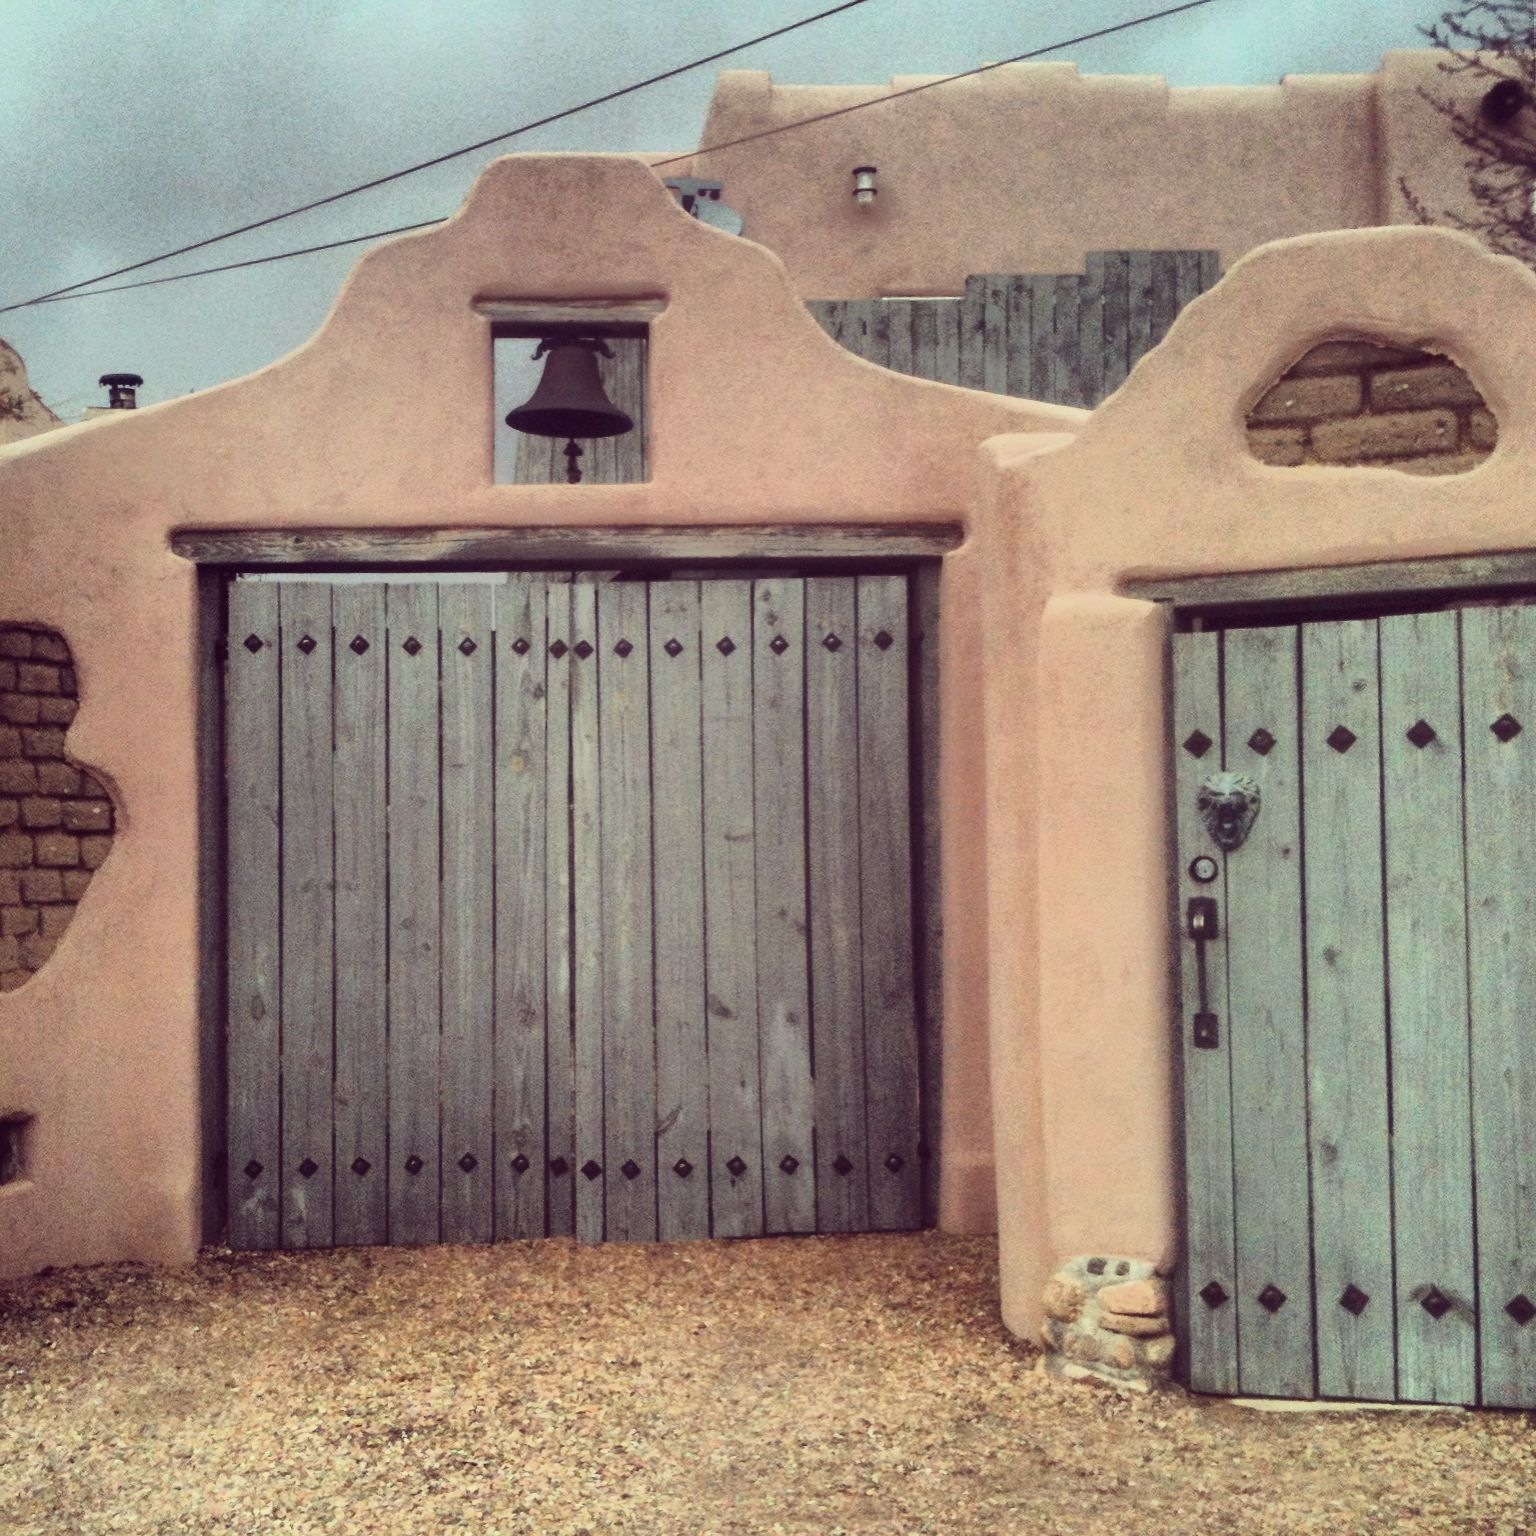 Doors of Santa Fe, NM. Adobe architecture .